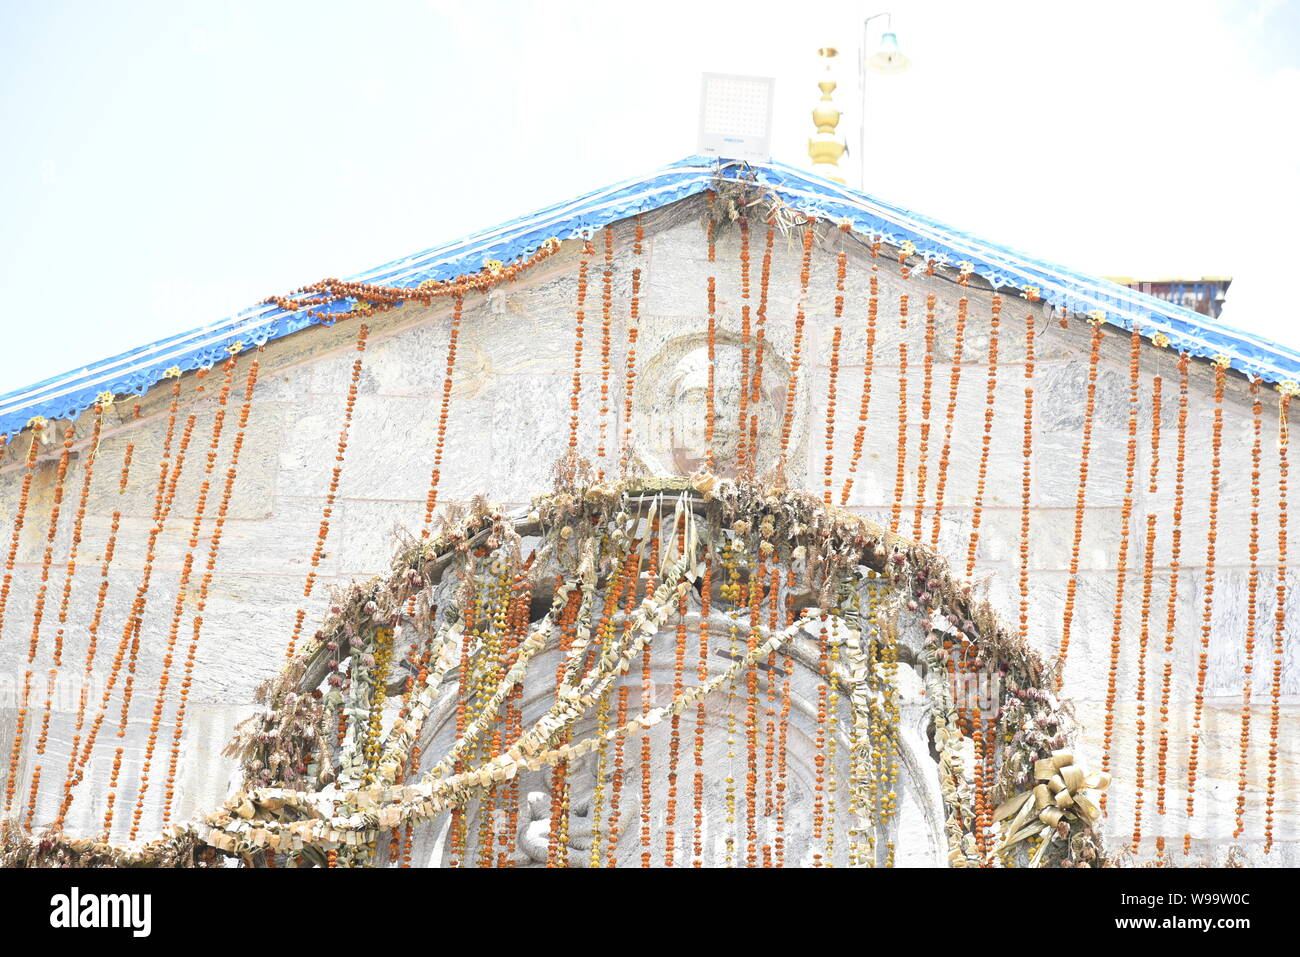 Santo tempio indù del Signore Shri Kedarnath Shankar Bholenath tempio 2019 vista in Chamoli/Rudraprayag Distretto , Uttrakhand , India , Asia Foto Stock